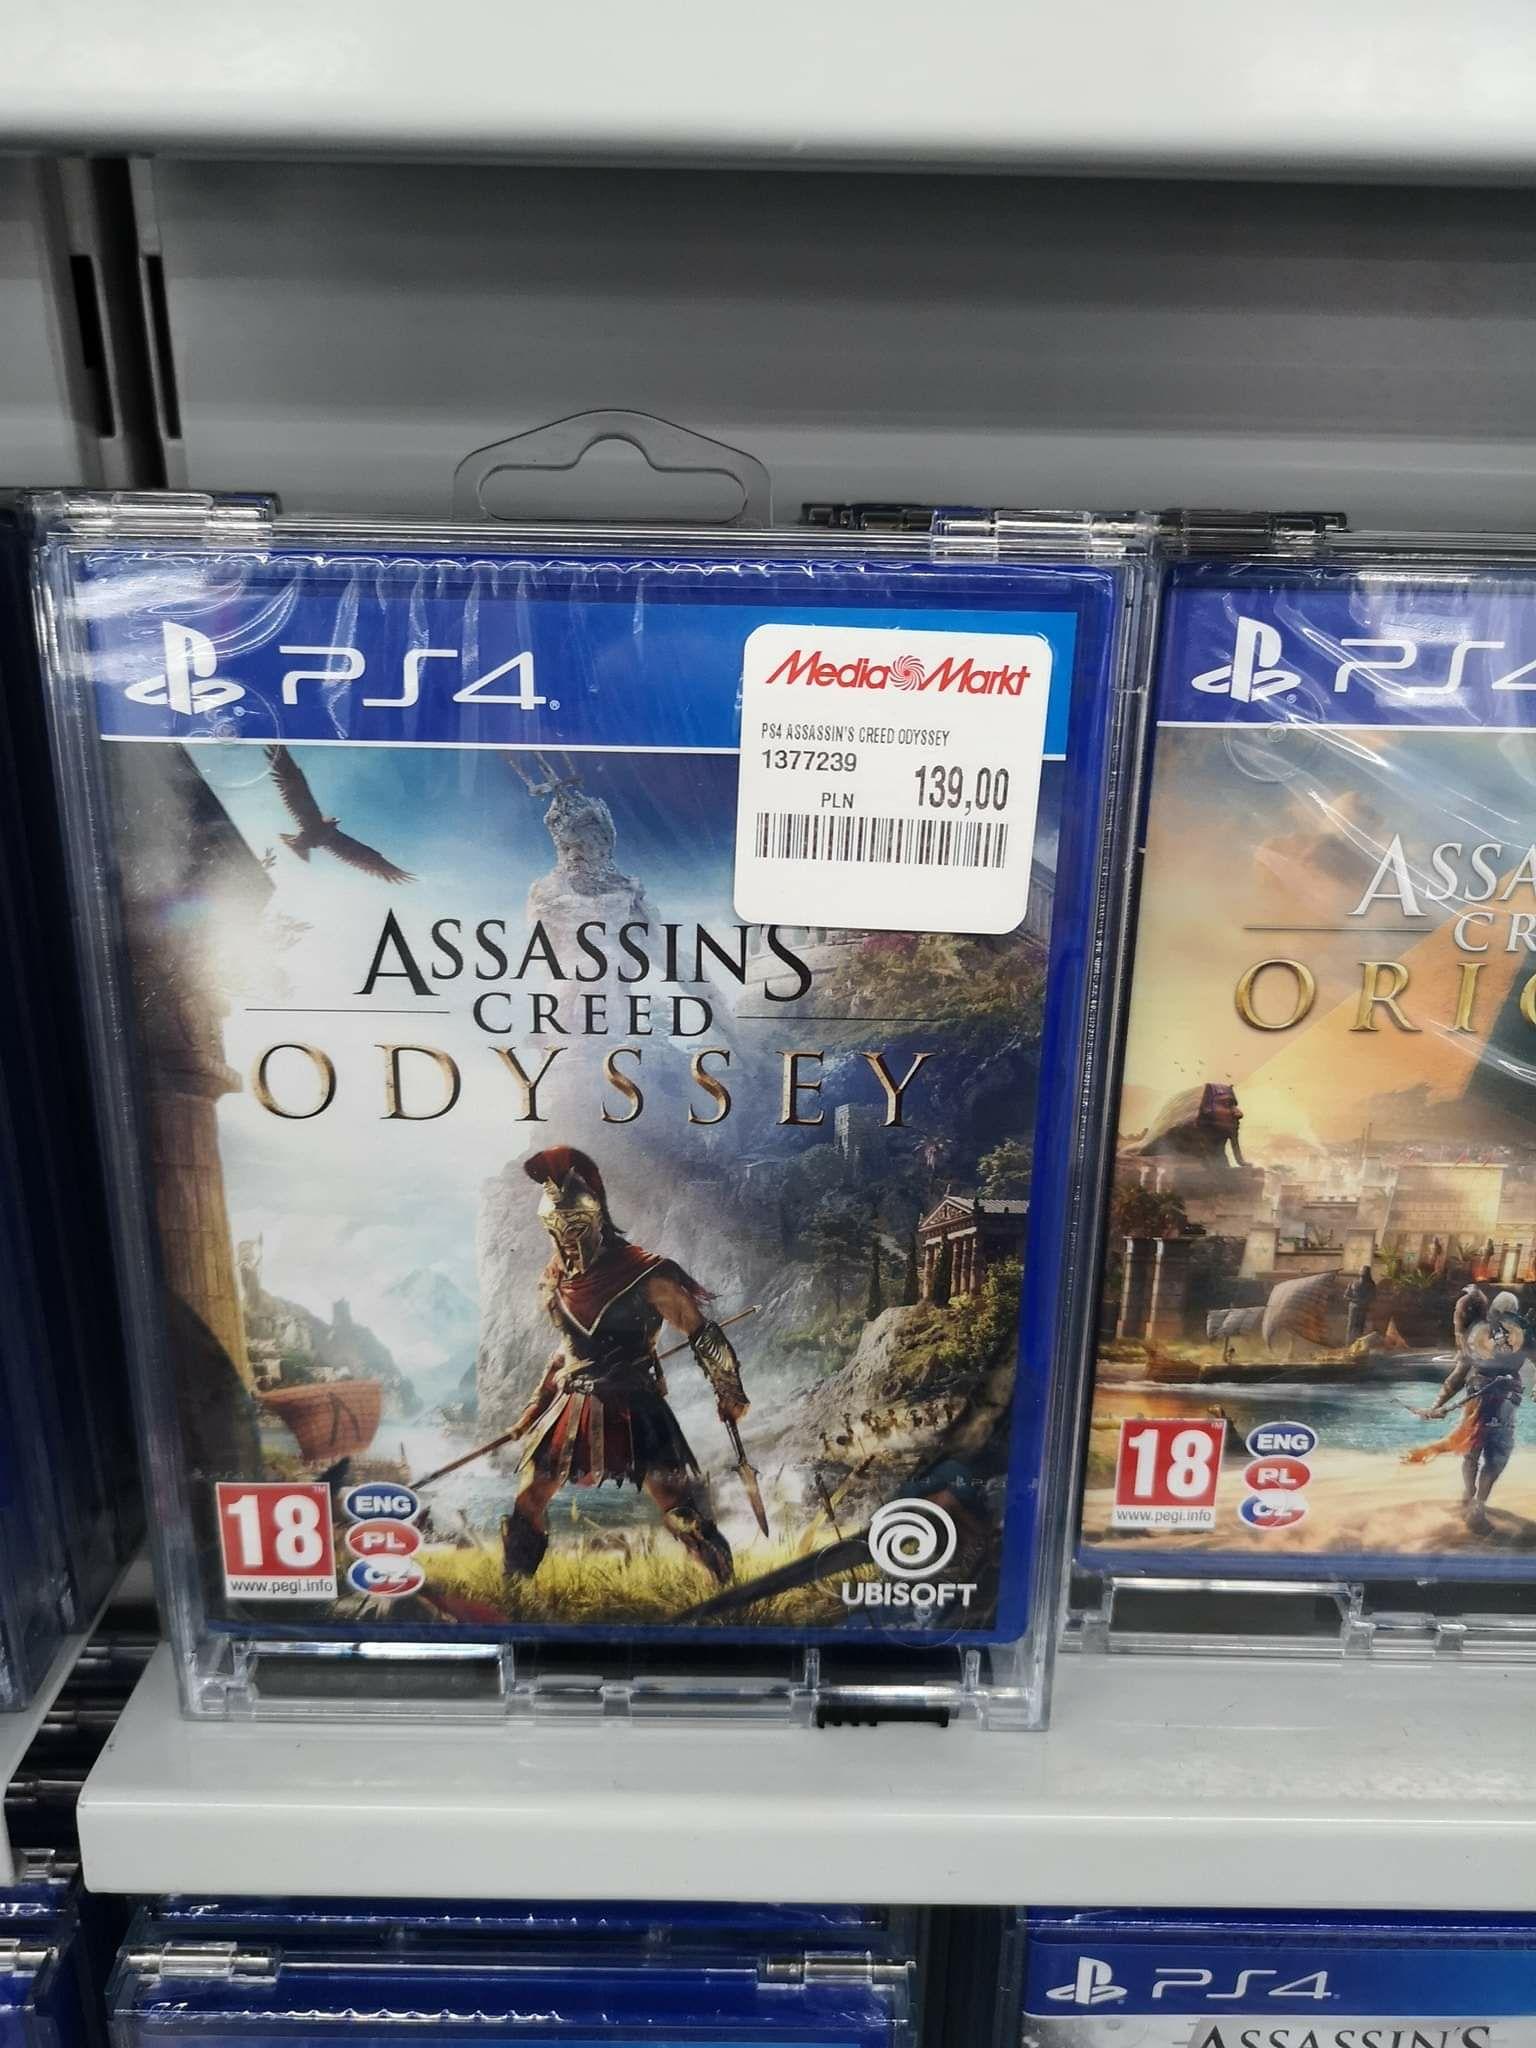 Assassin's Creed Odyssey w Media Market